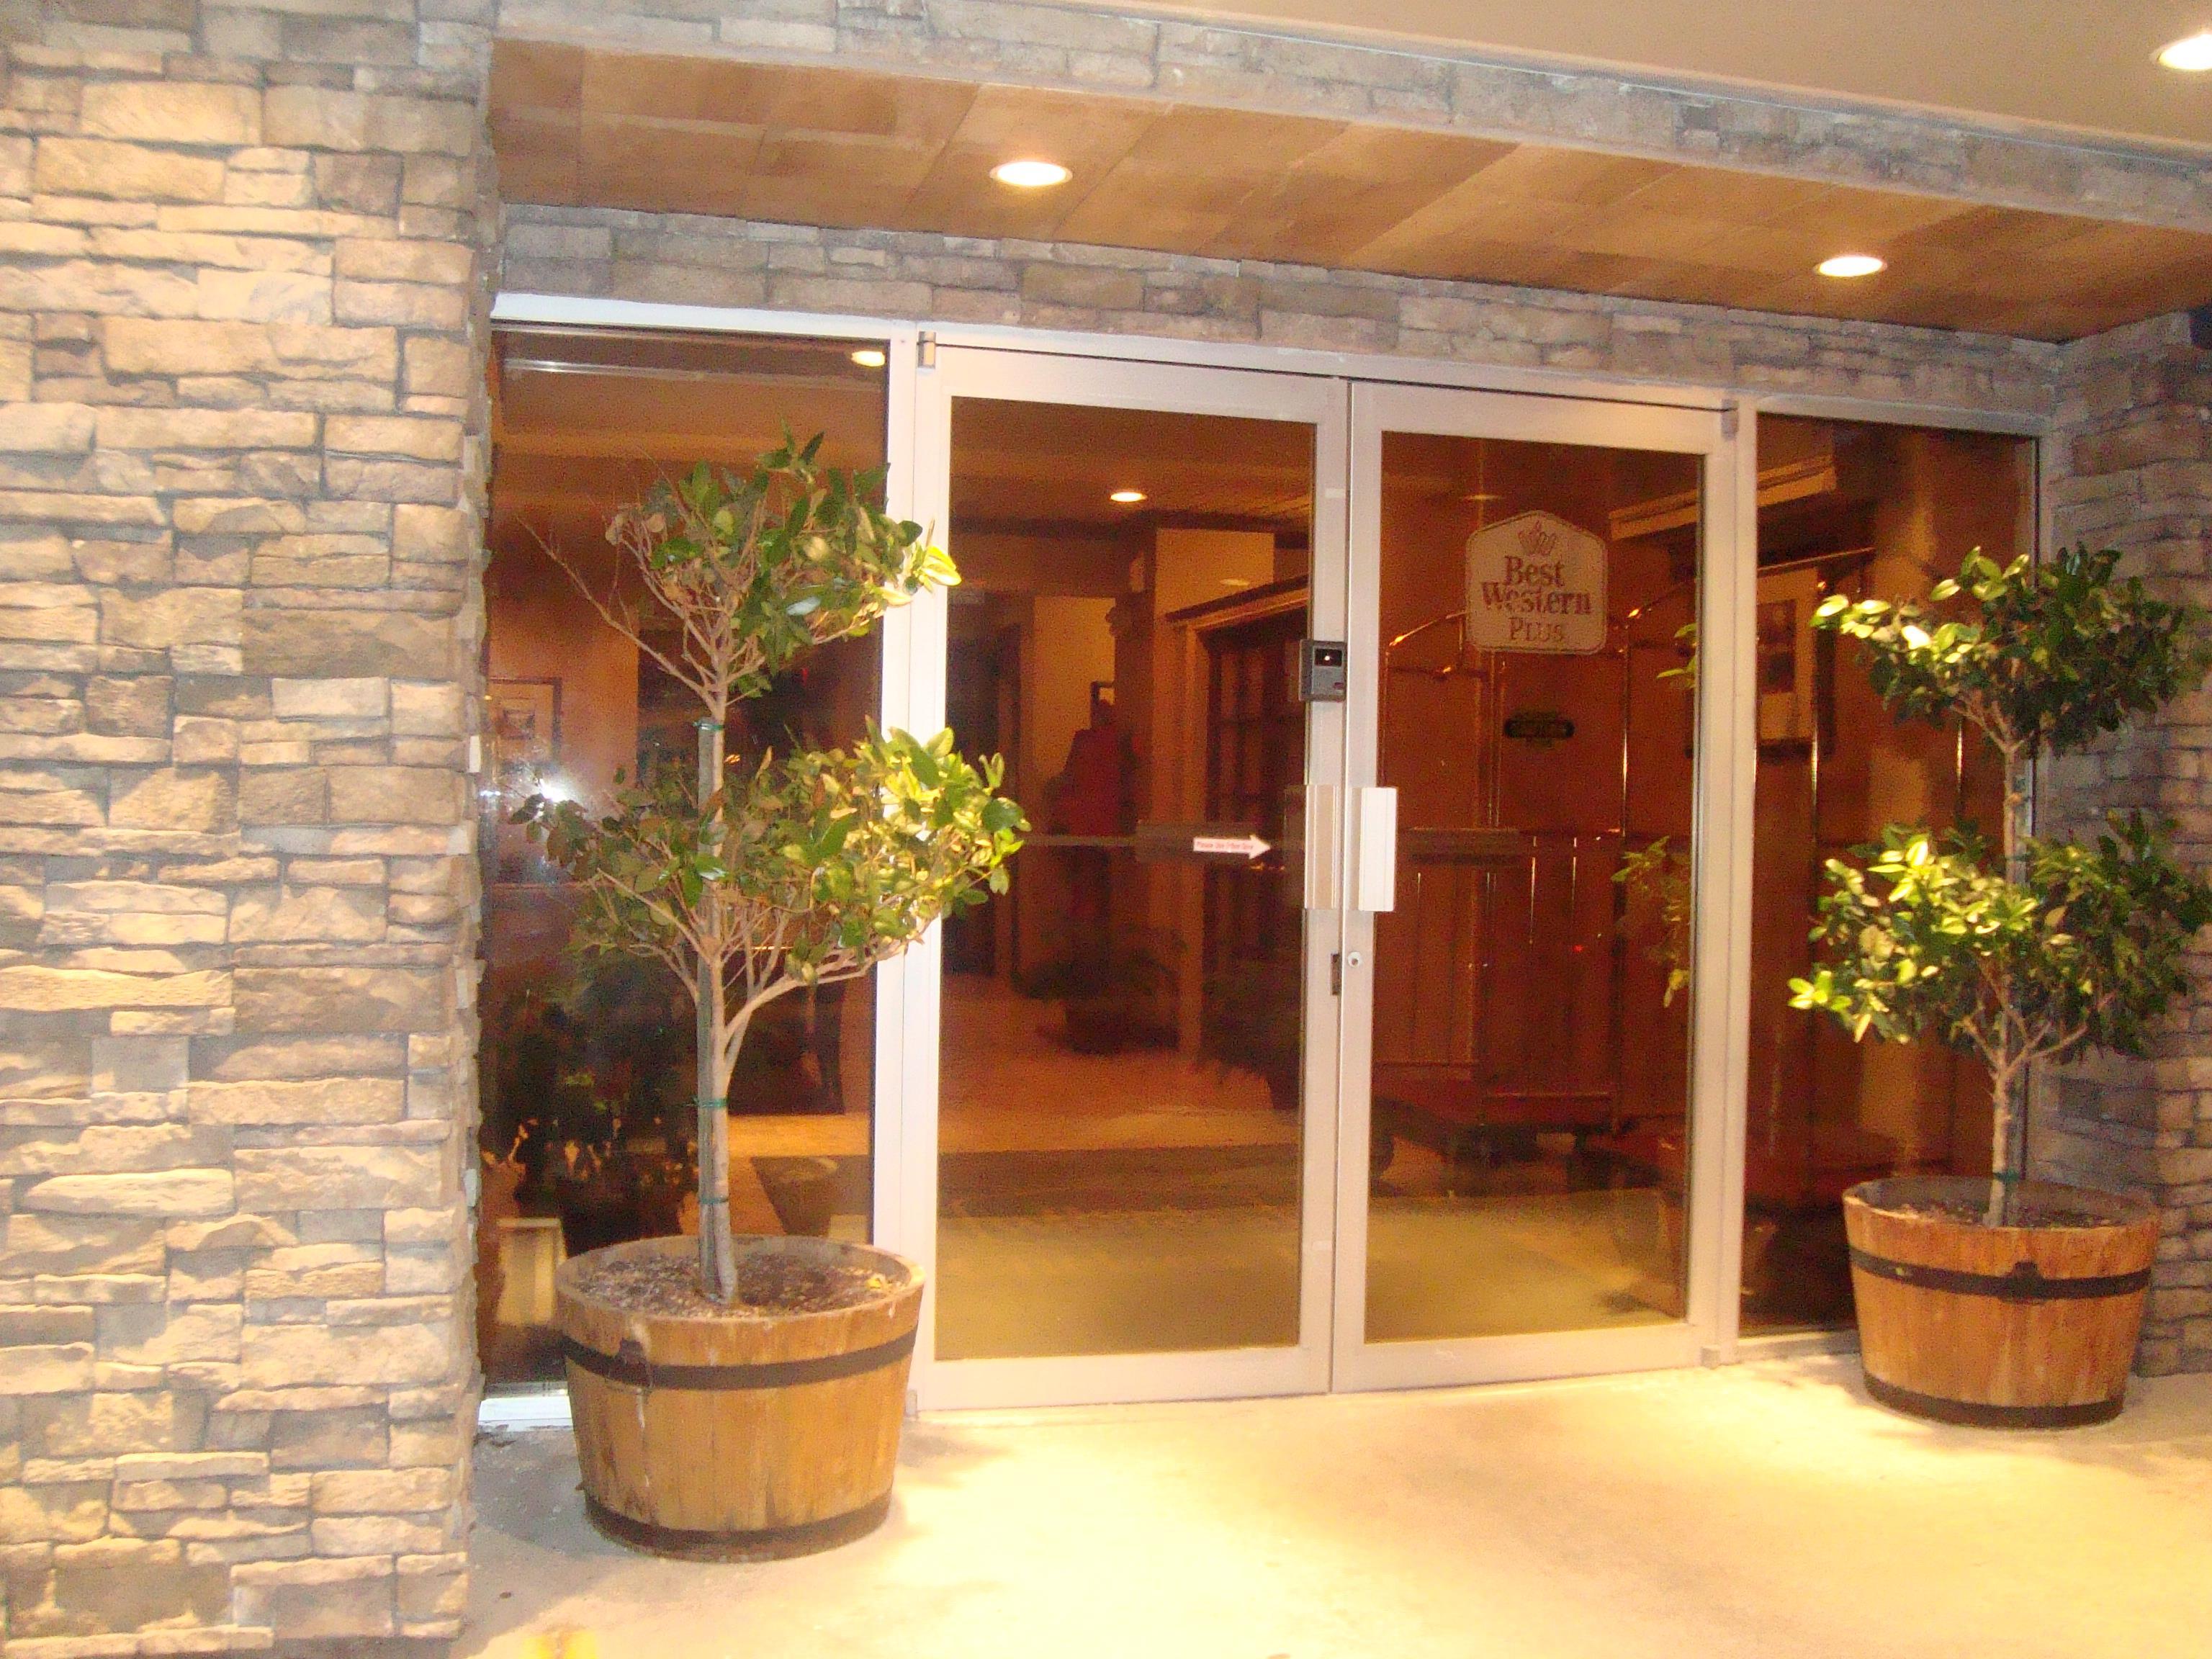 Best Western Chelsea Inn in Coquitlam: BEST WESTERN Chelsea Inn